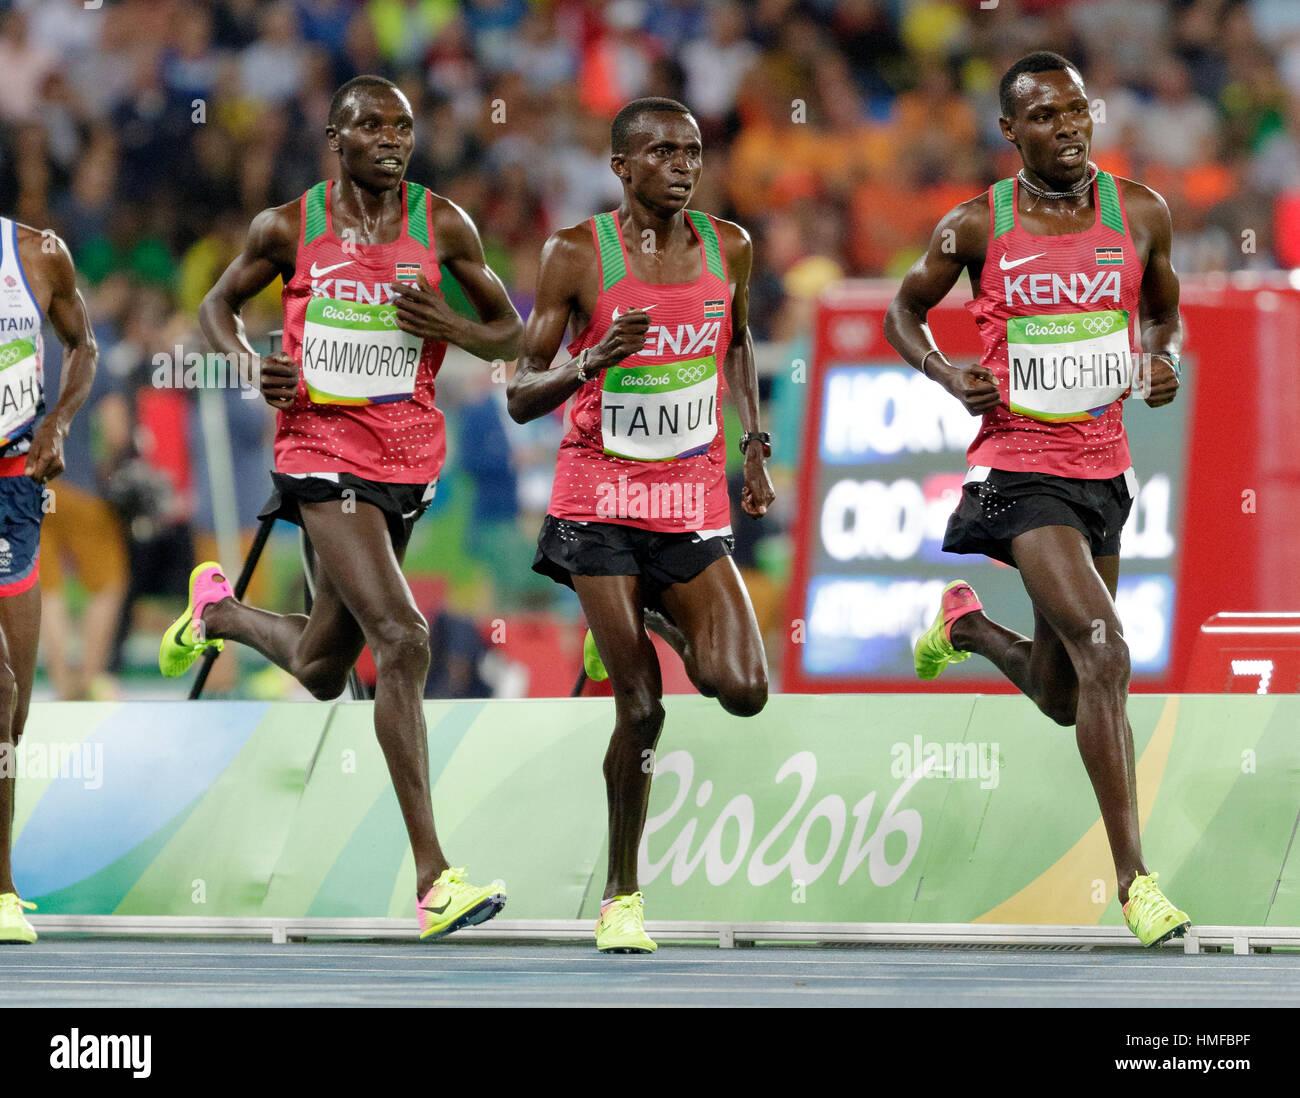 Rio de Janeiro, Brazil. 13 August 2016.  Athletics, Men's 10.000m final at the 2016 Olympic Summer Games. ©Paul Stock Photo